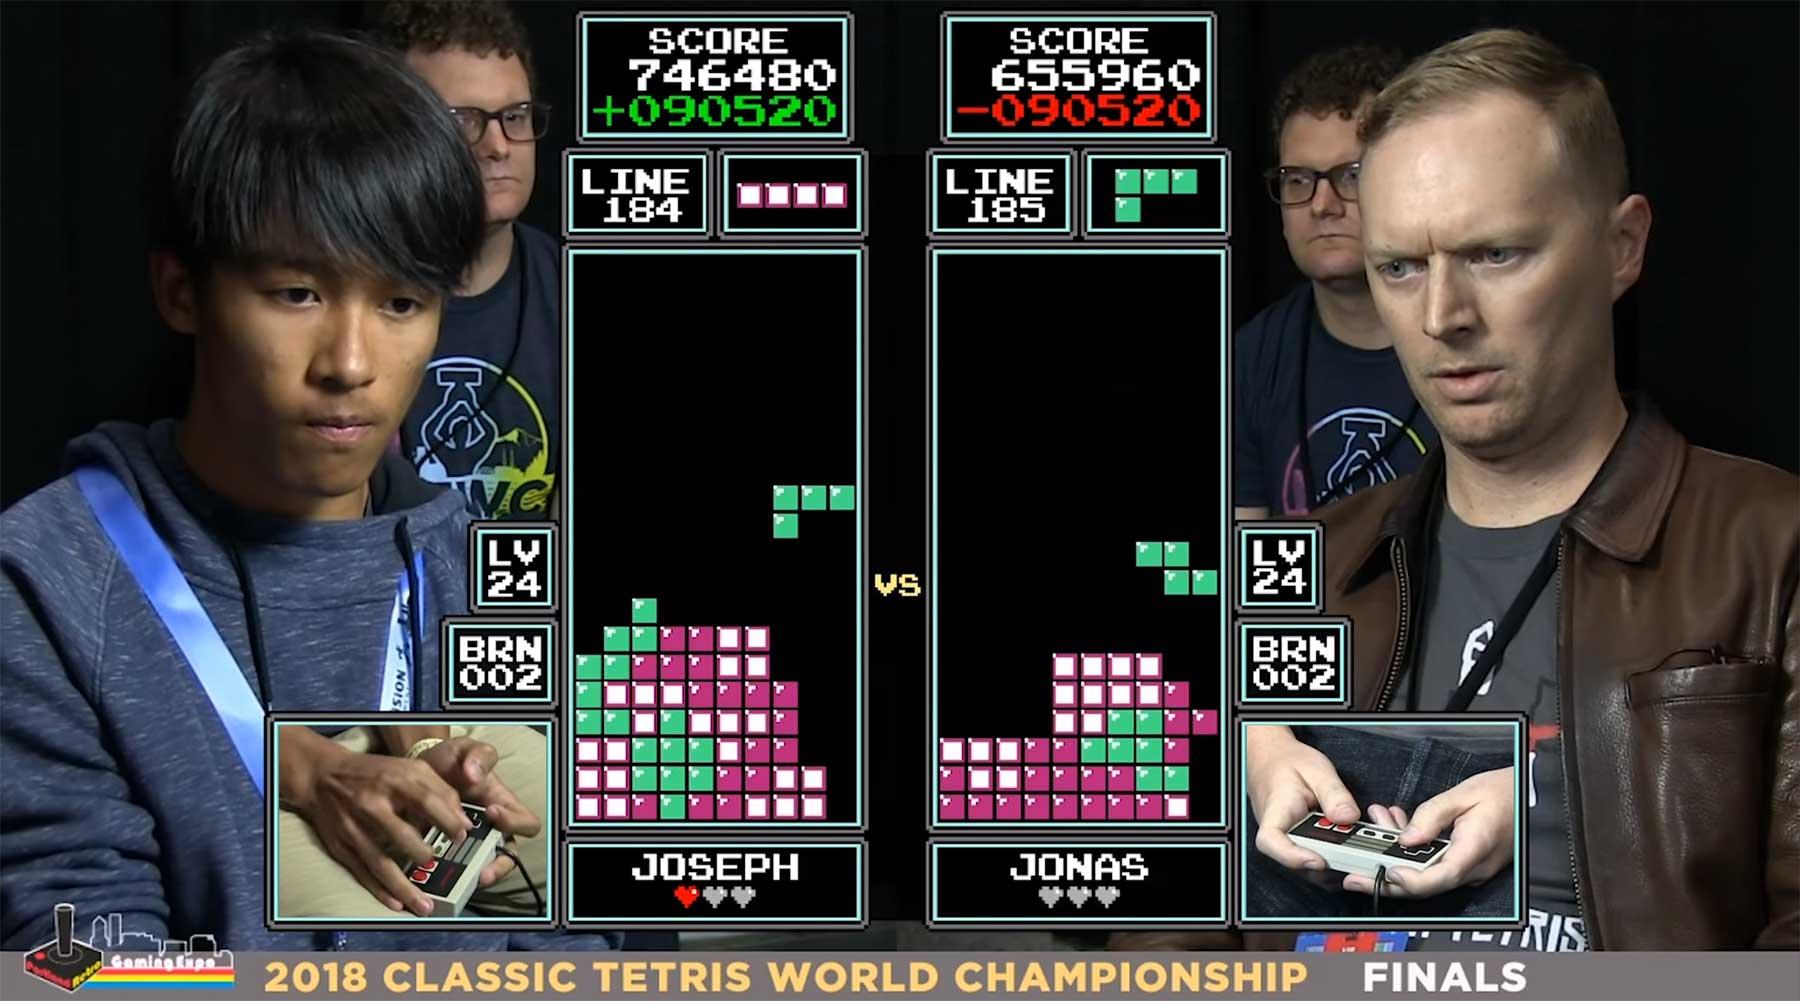 Das finale Duell um die Tetris-Weltmeisterschaft 2018